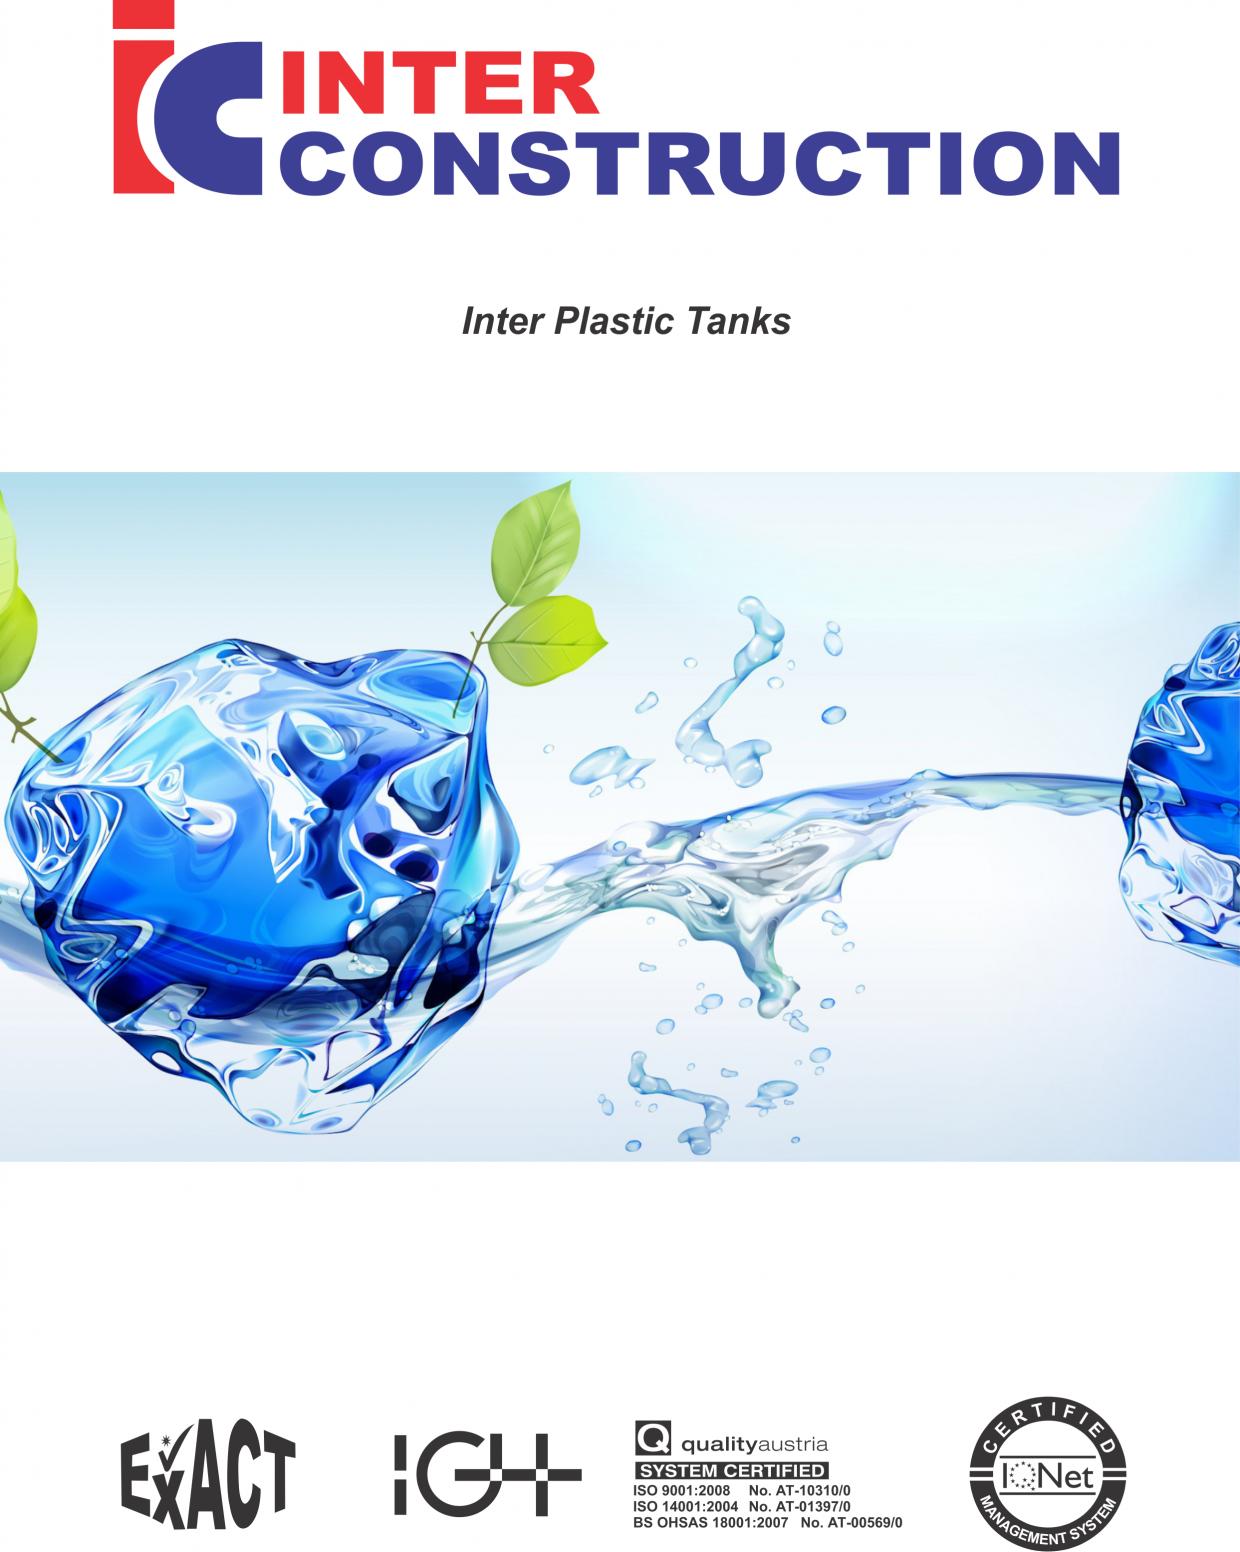 plastic tanks inter construction